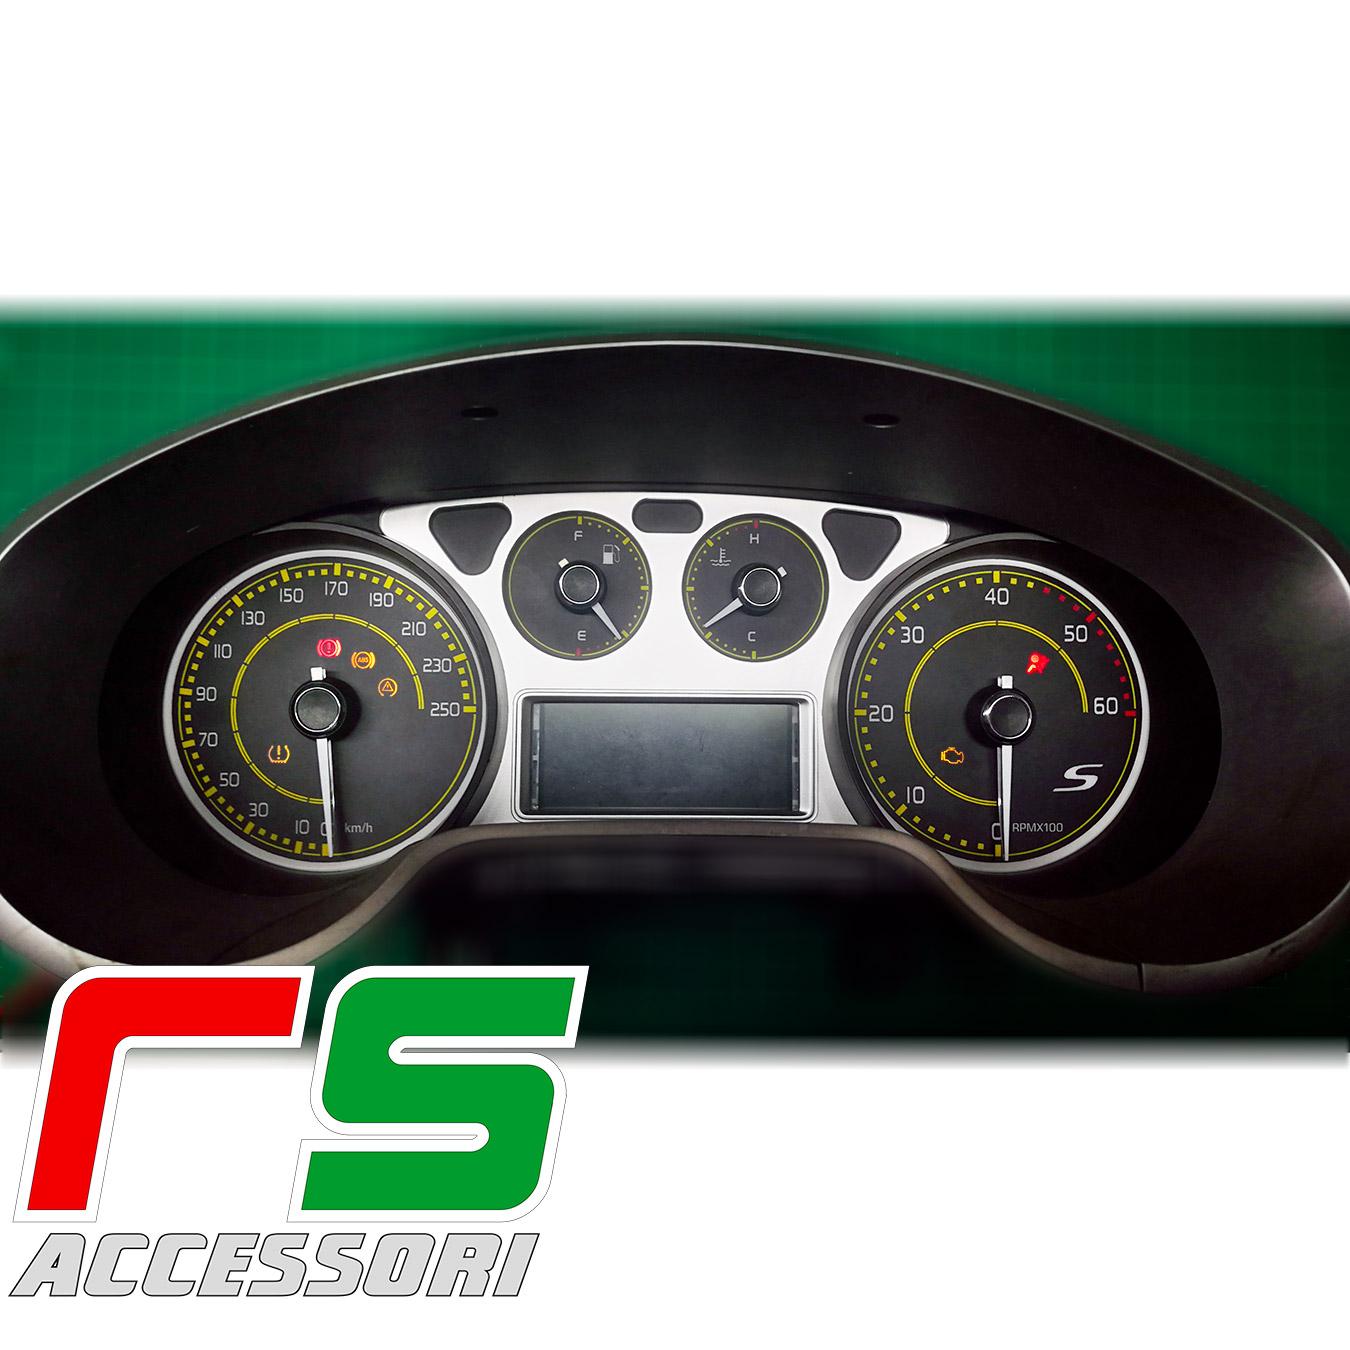 instrument panels Lancia Delta JTDM replica S